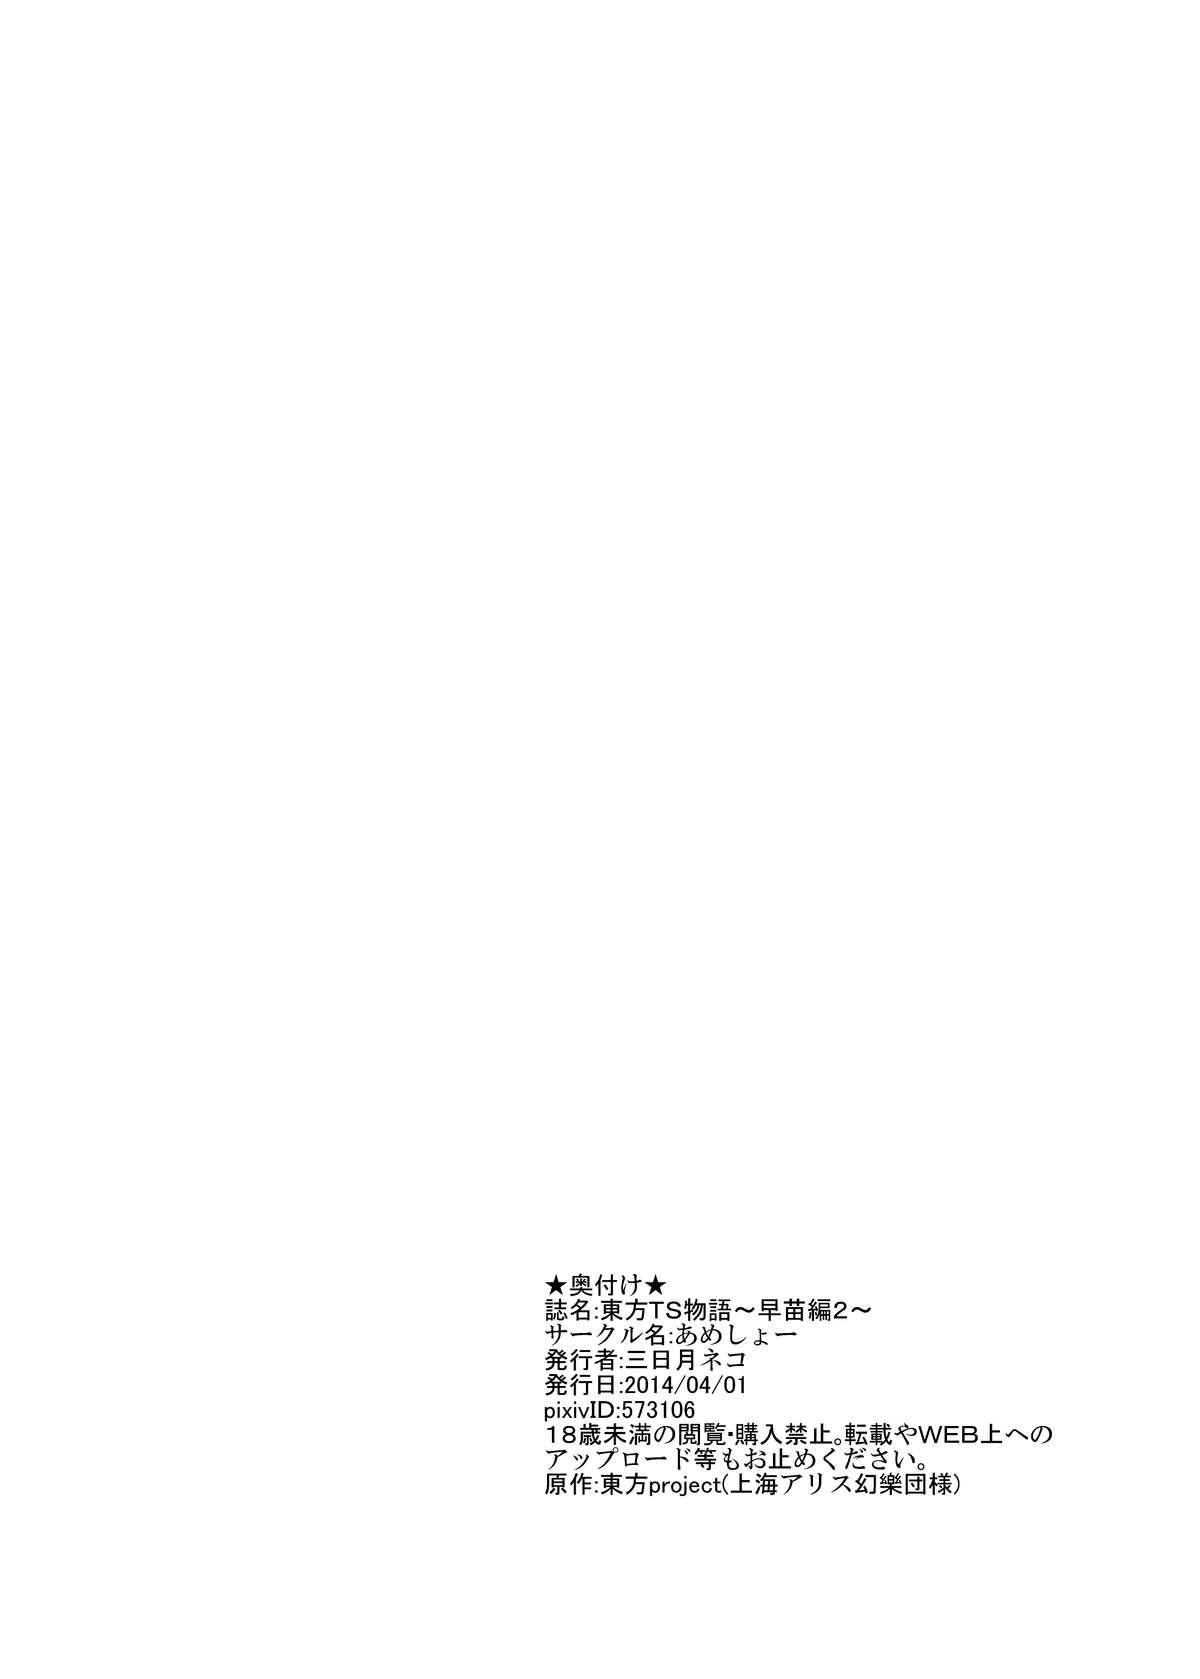 Touhou TS monogatari 24